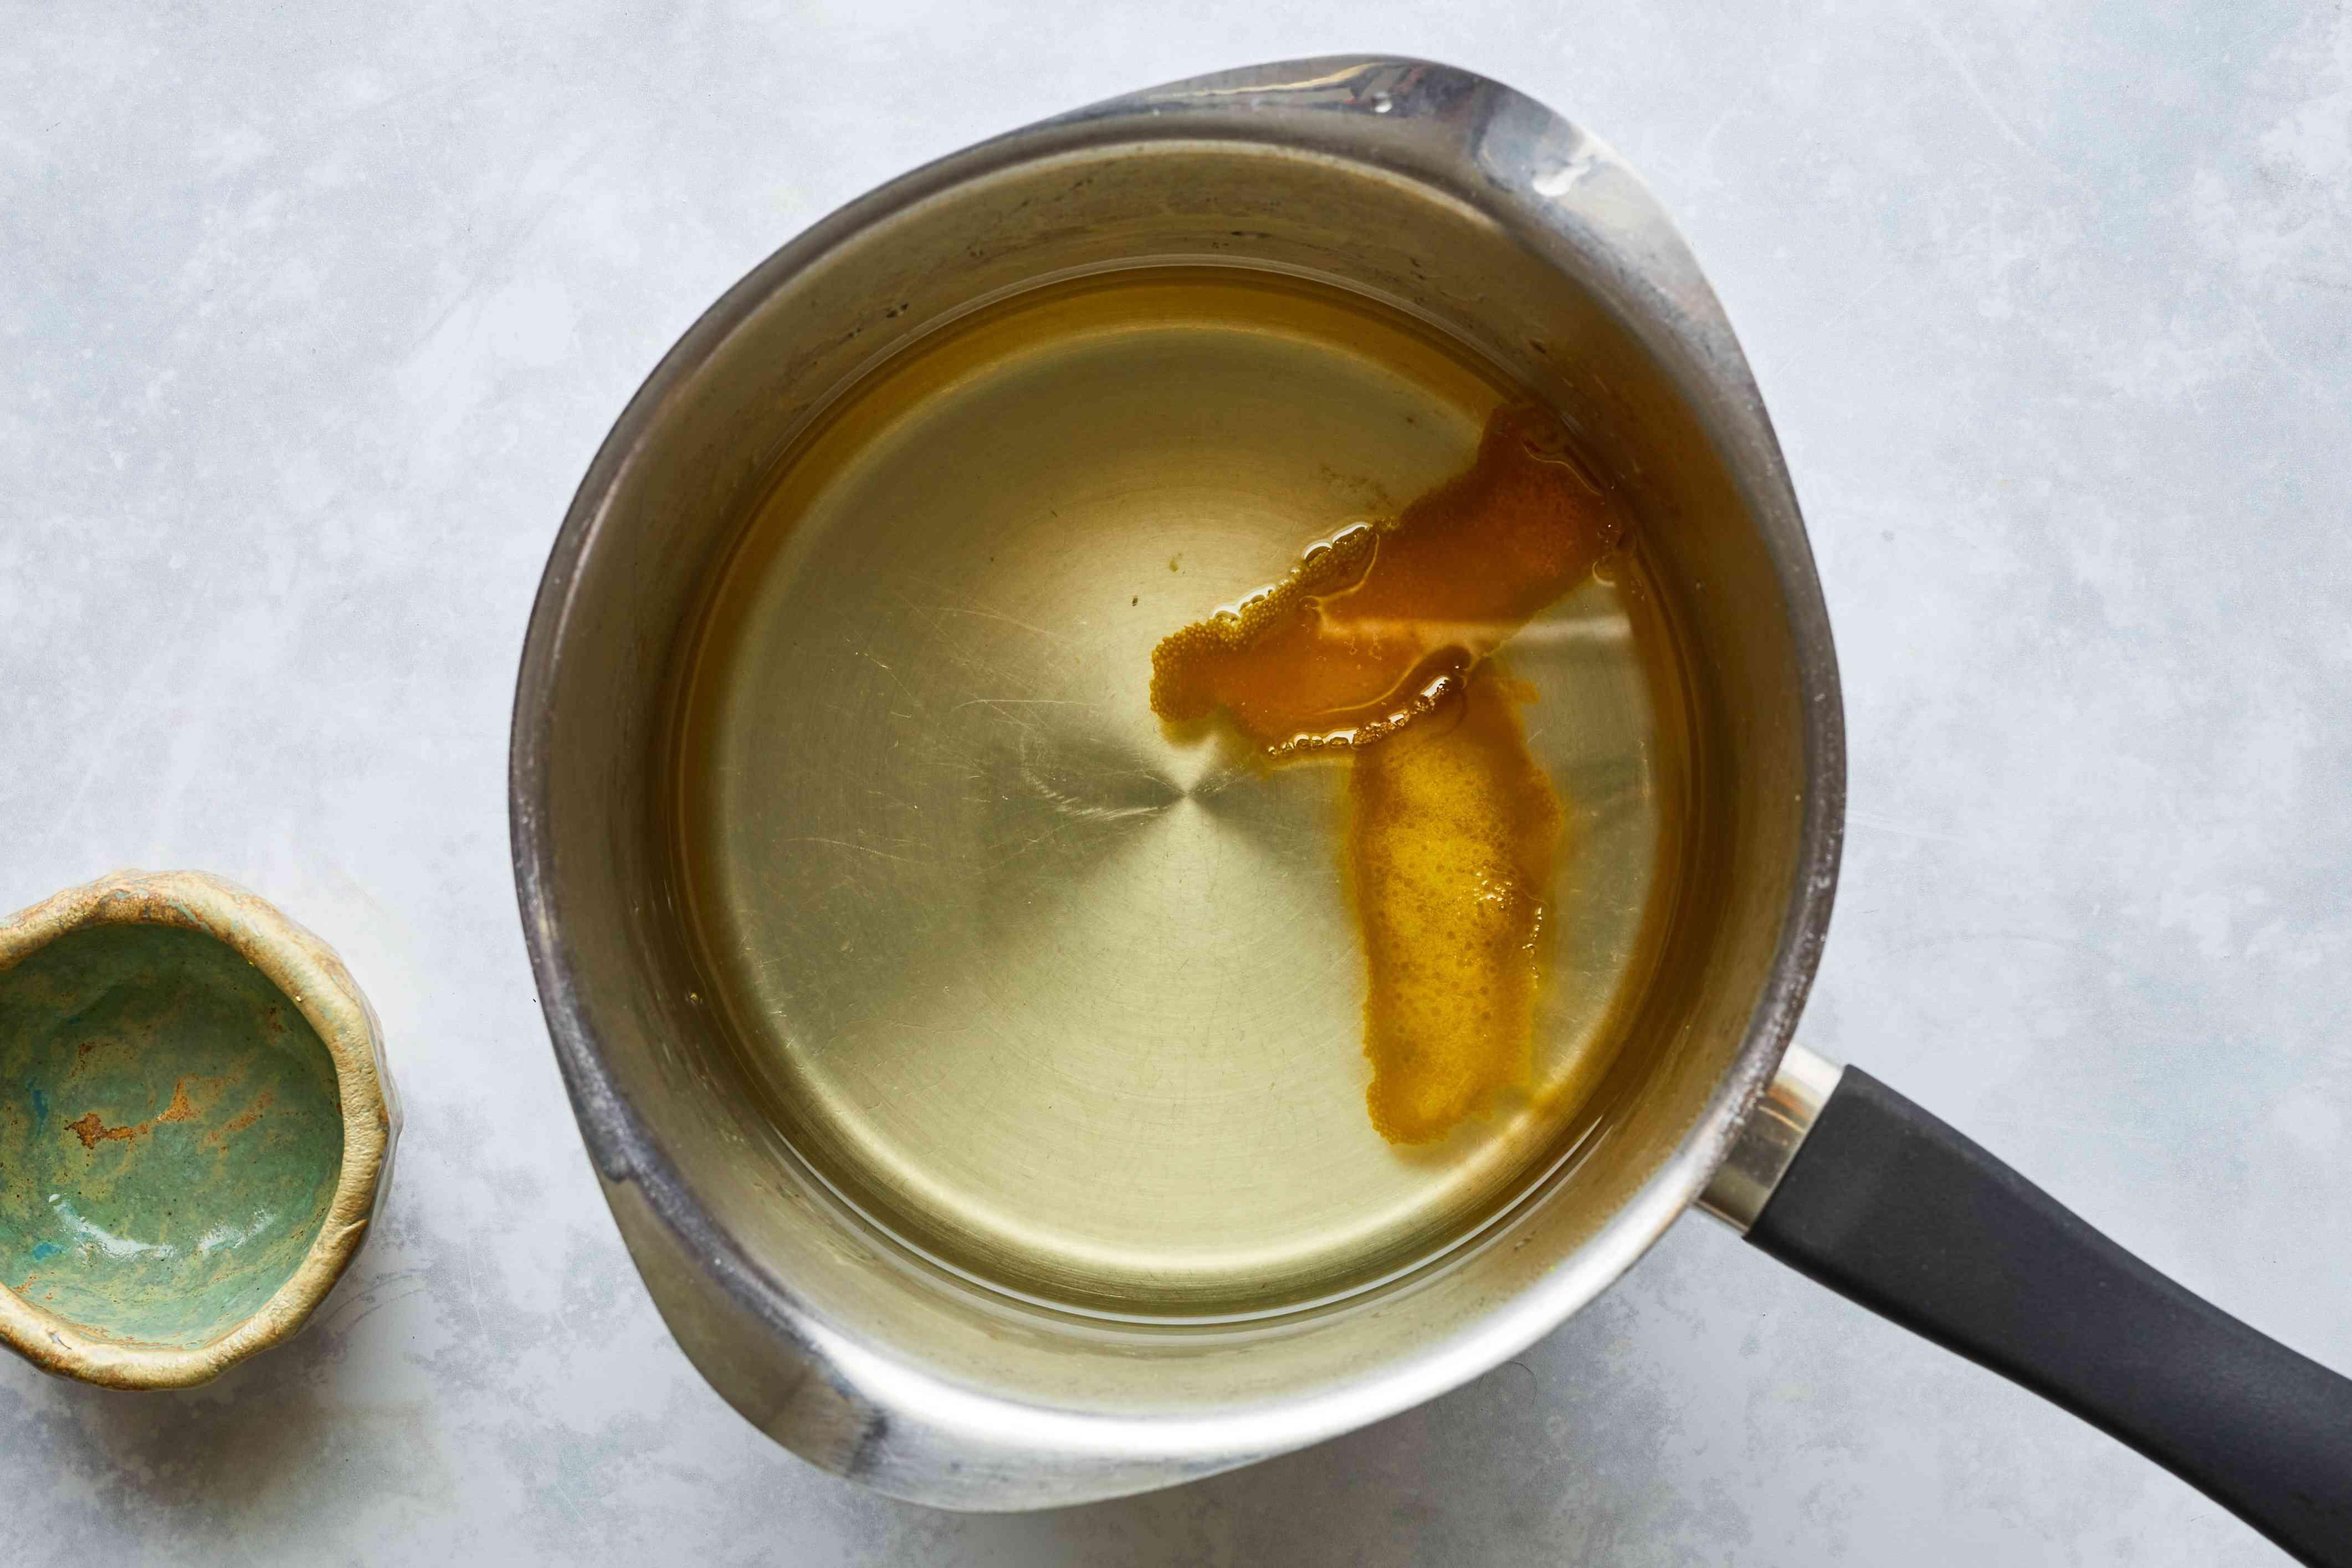 Water, sugar, orange zest, and lemon juice for revani cake syrup